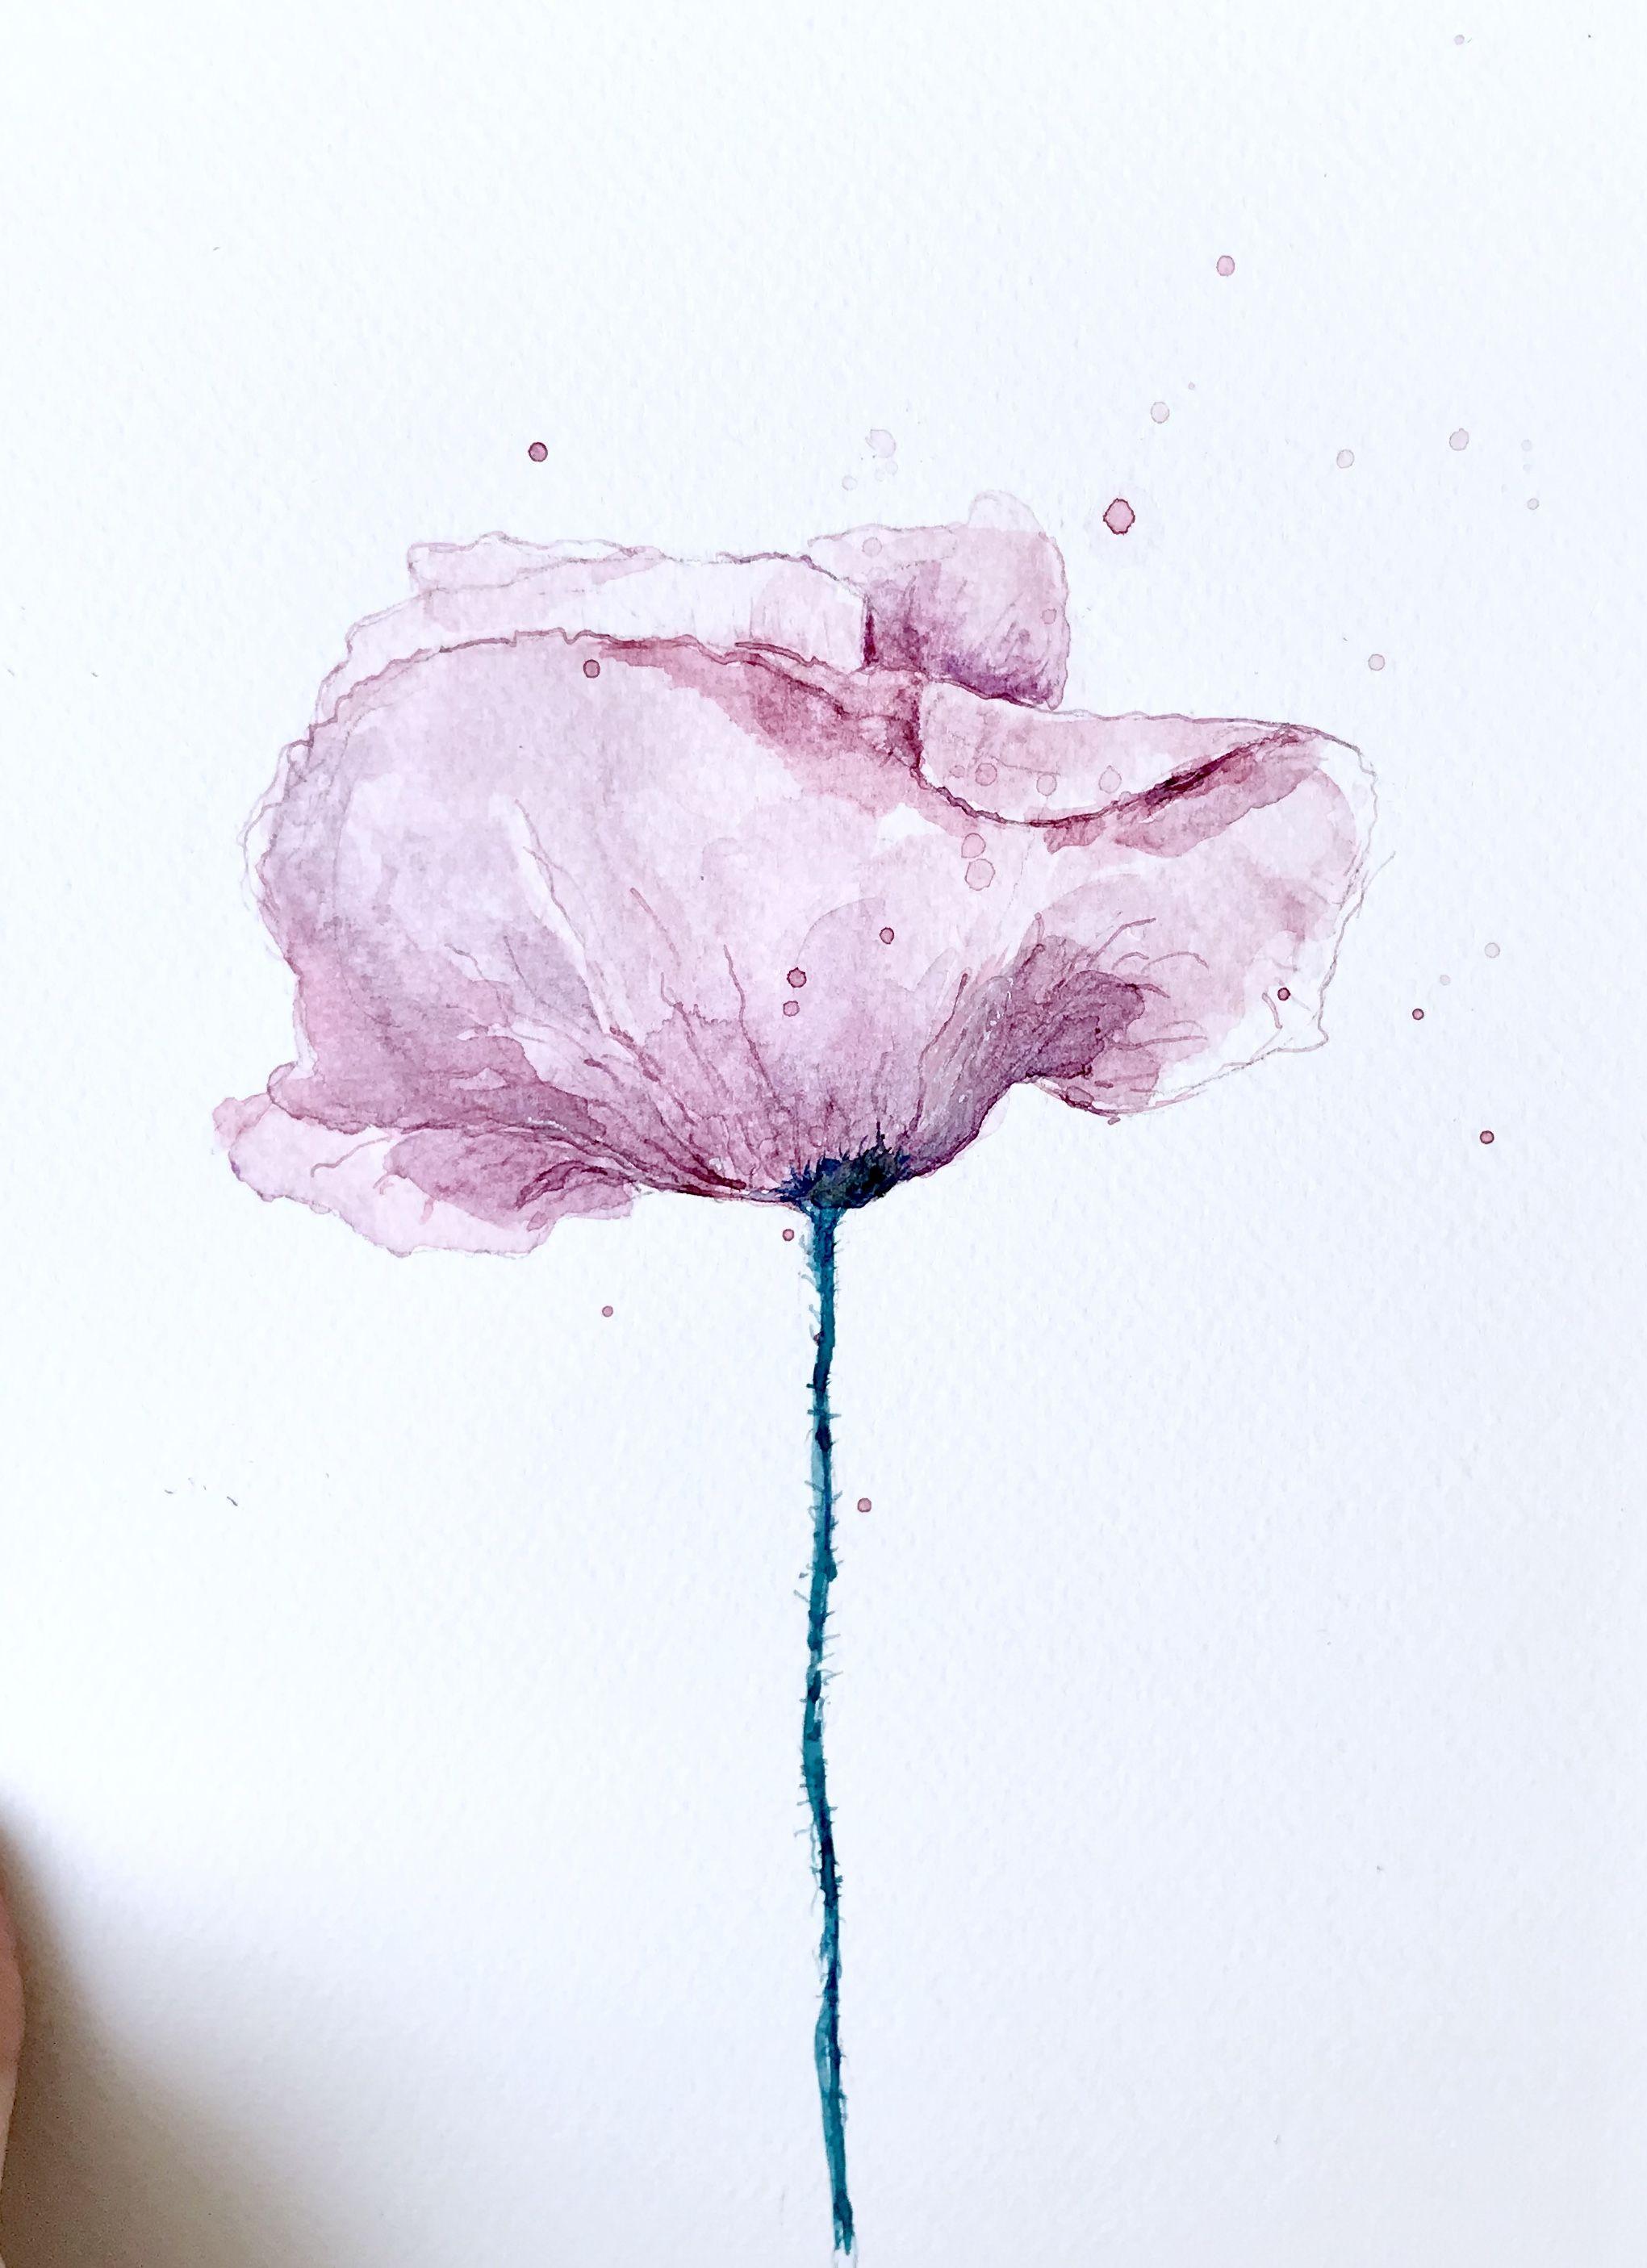 Pink Poppy Flower Watercolour Painting Aquarell Ideen Blumen Aquarell Aquarell Malen